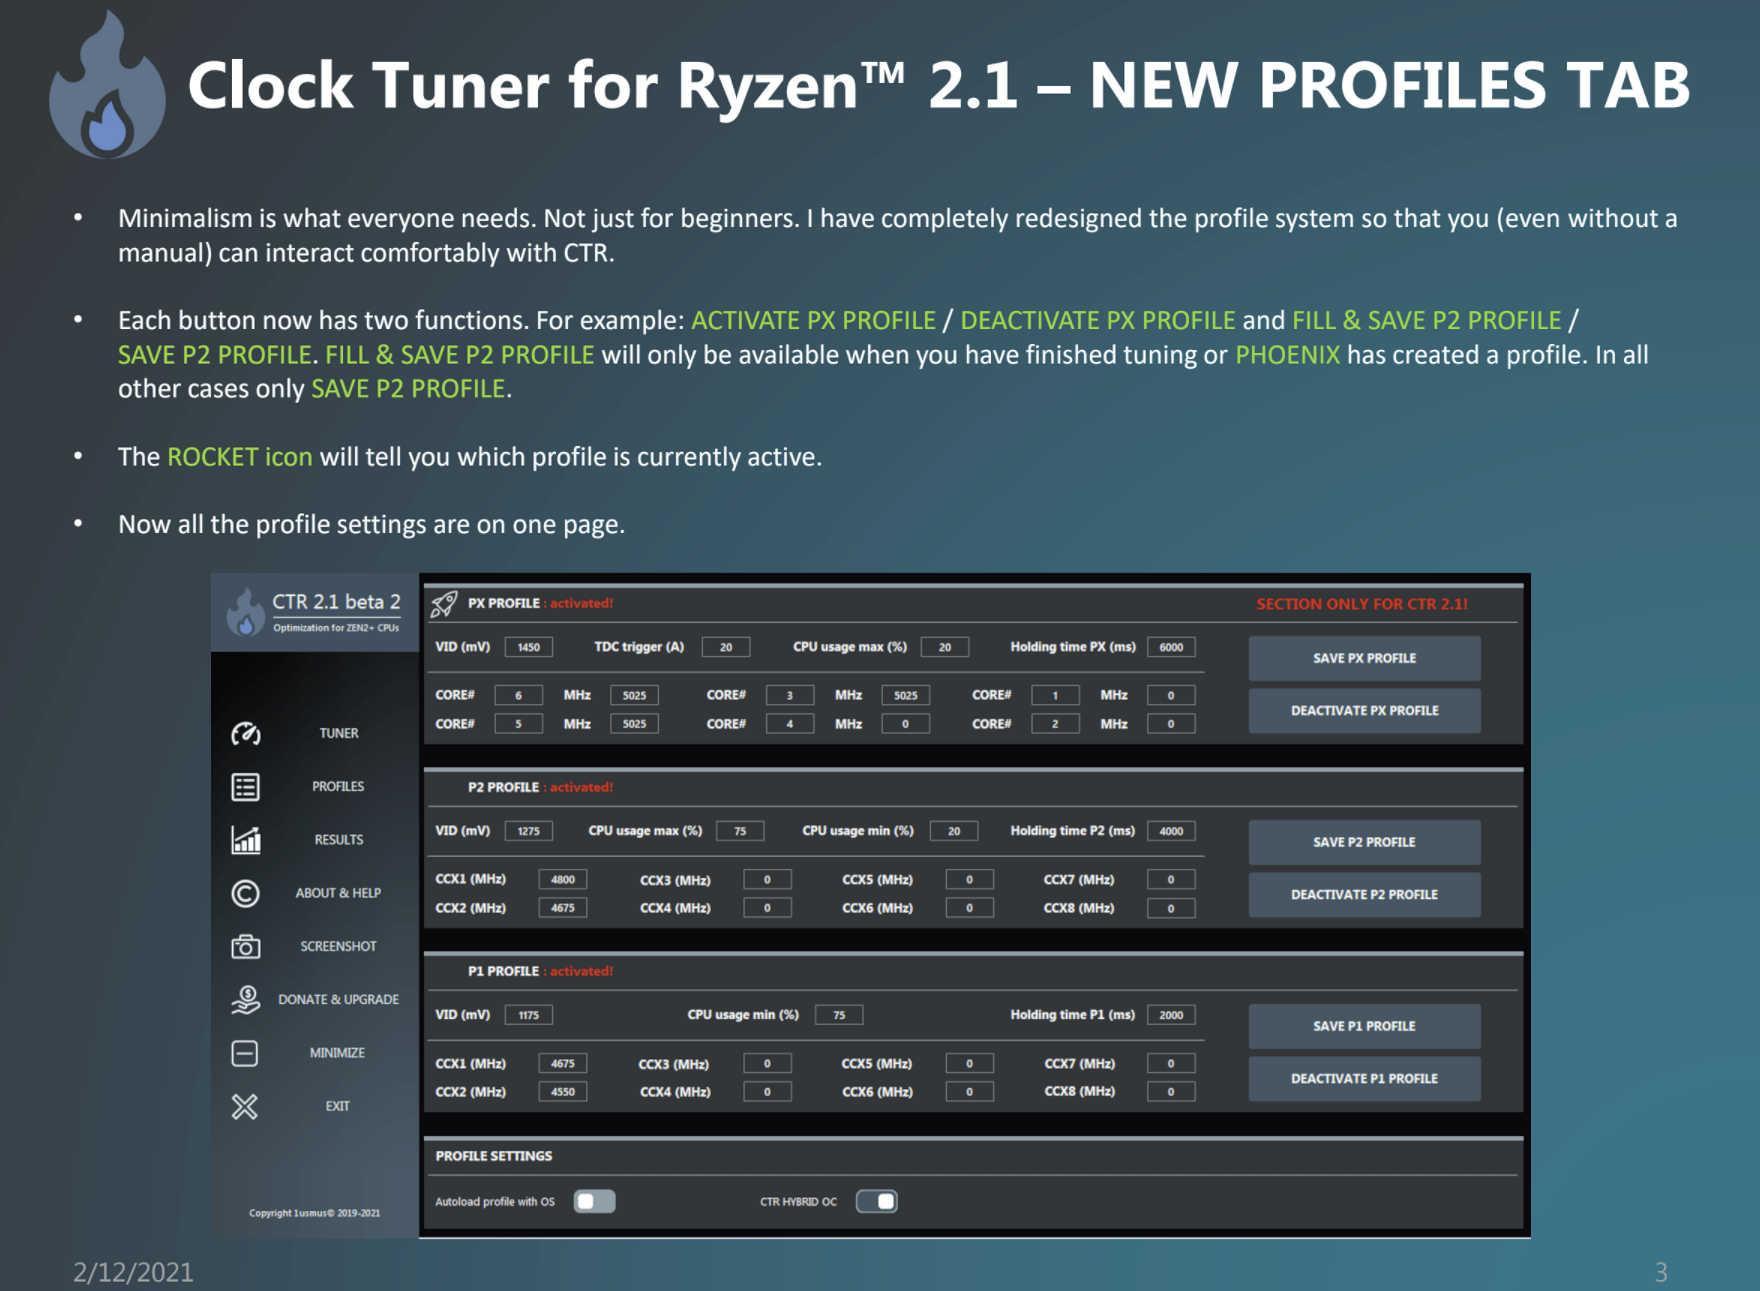 Clocktuner For Ryzen 2.1 Ctr Tool Hybrid Oc Ryzen 5000 Profil